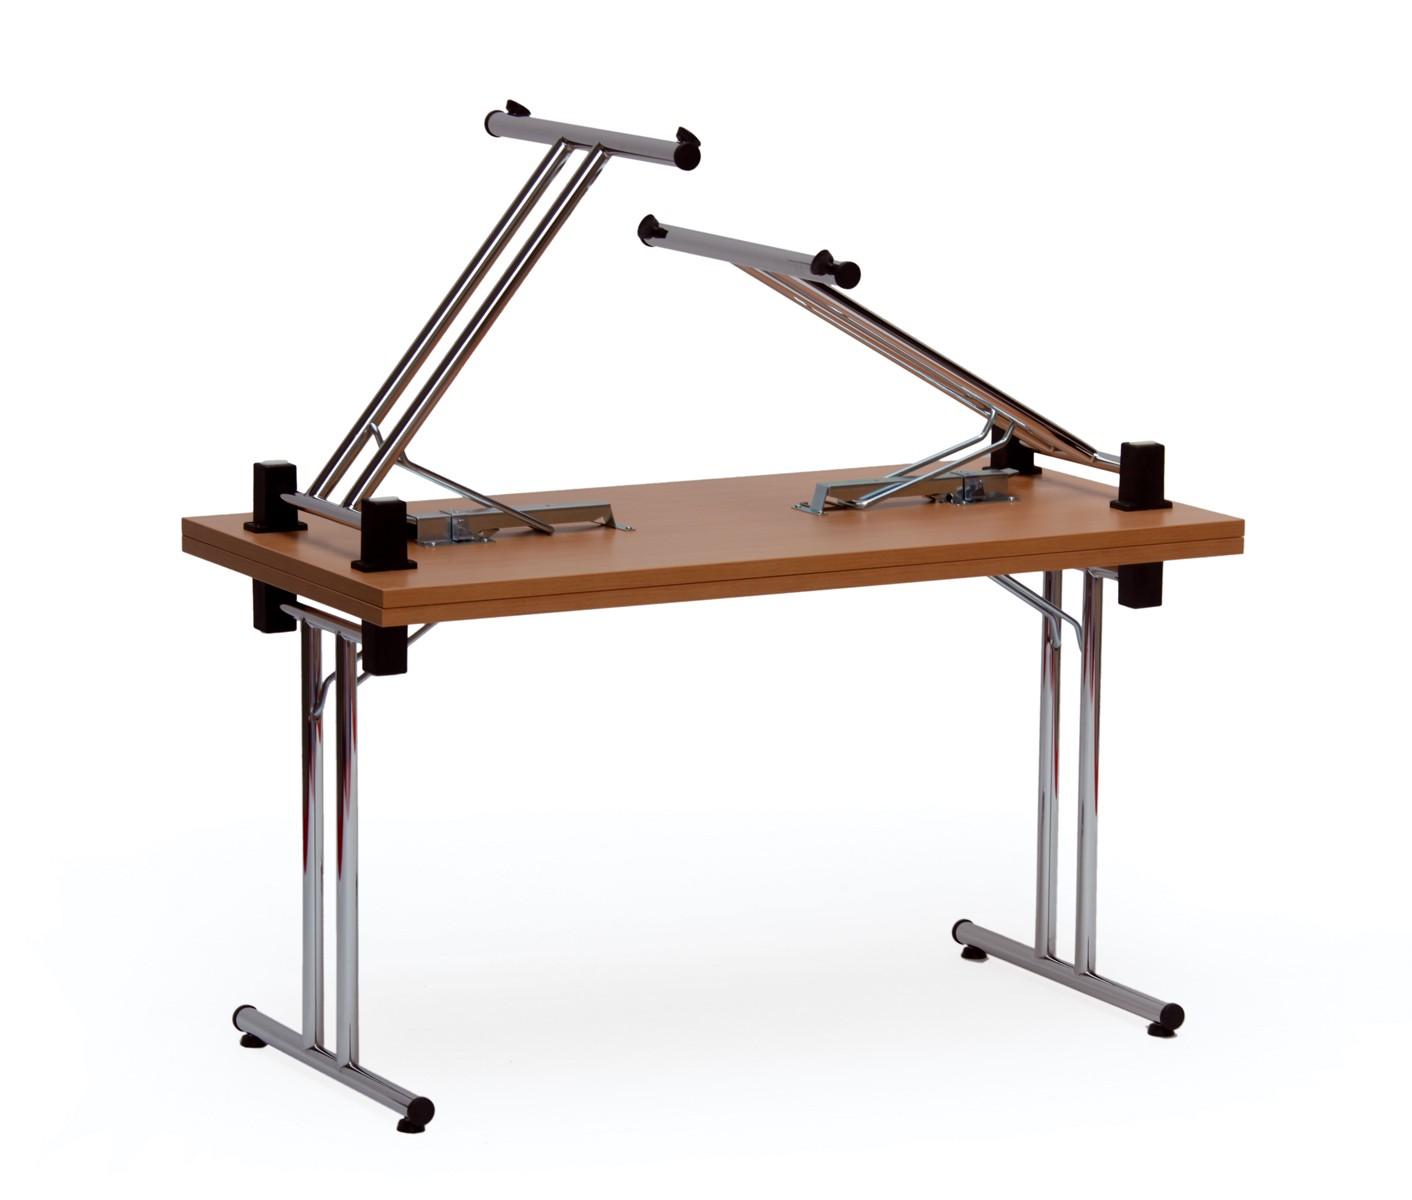 Table pliante empilable komino achat tables pliantes et for Table pliante